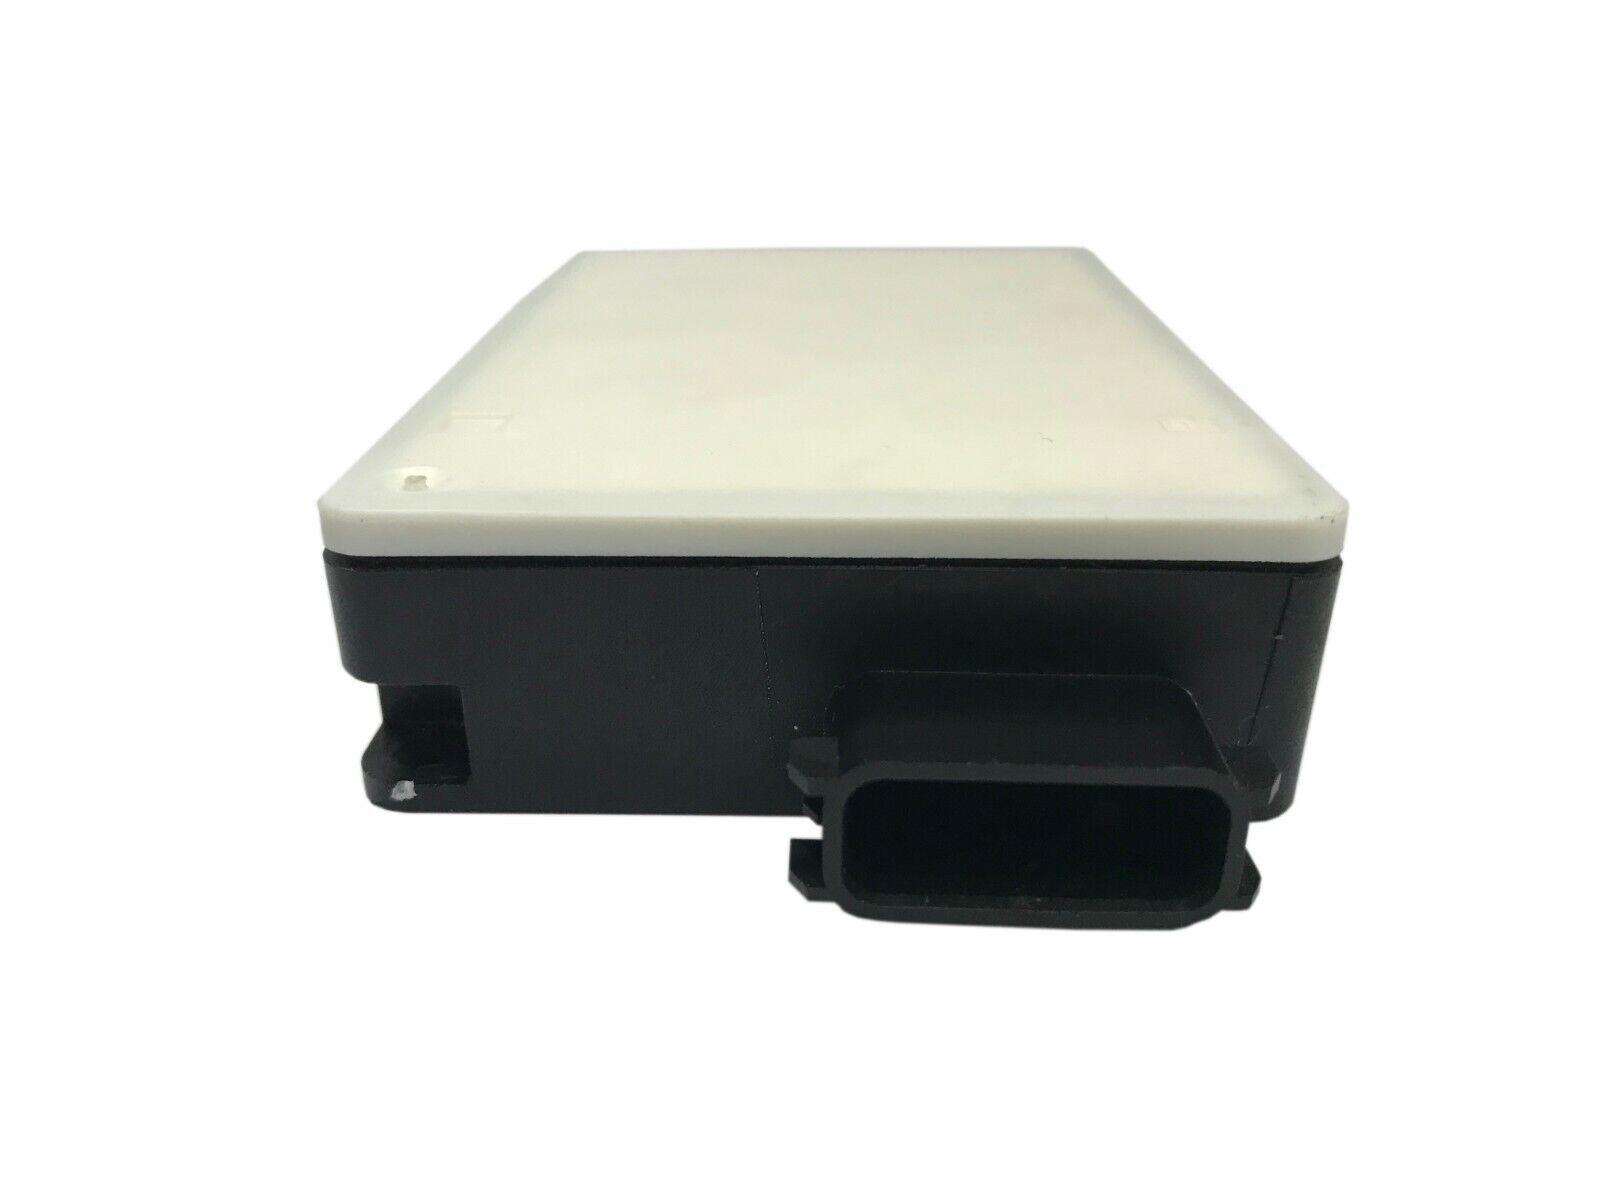 Sensor Radar Mercedes Ángulo Muerto Asistente Clase C W205 W212 A0009056103 Neu